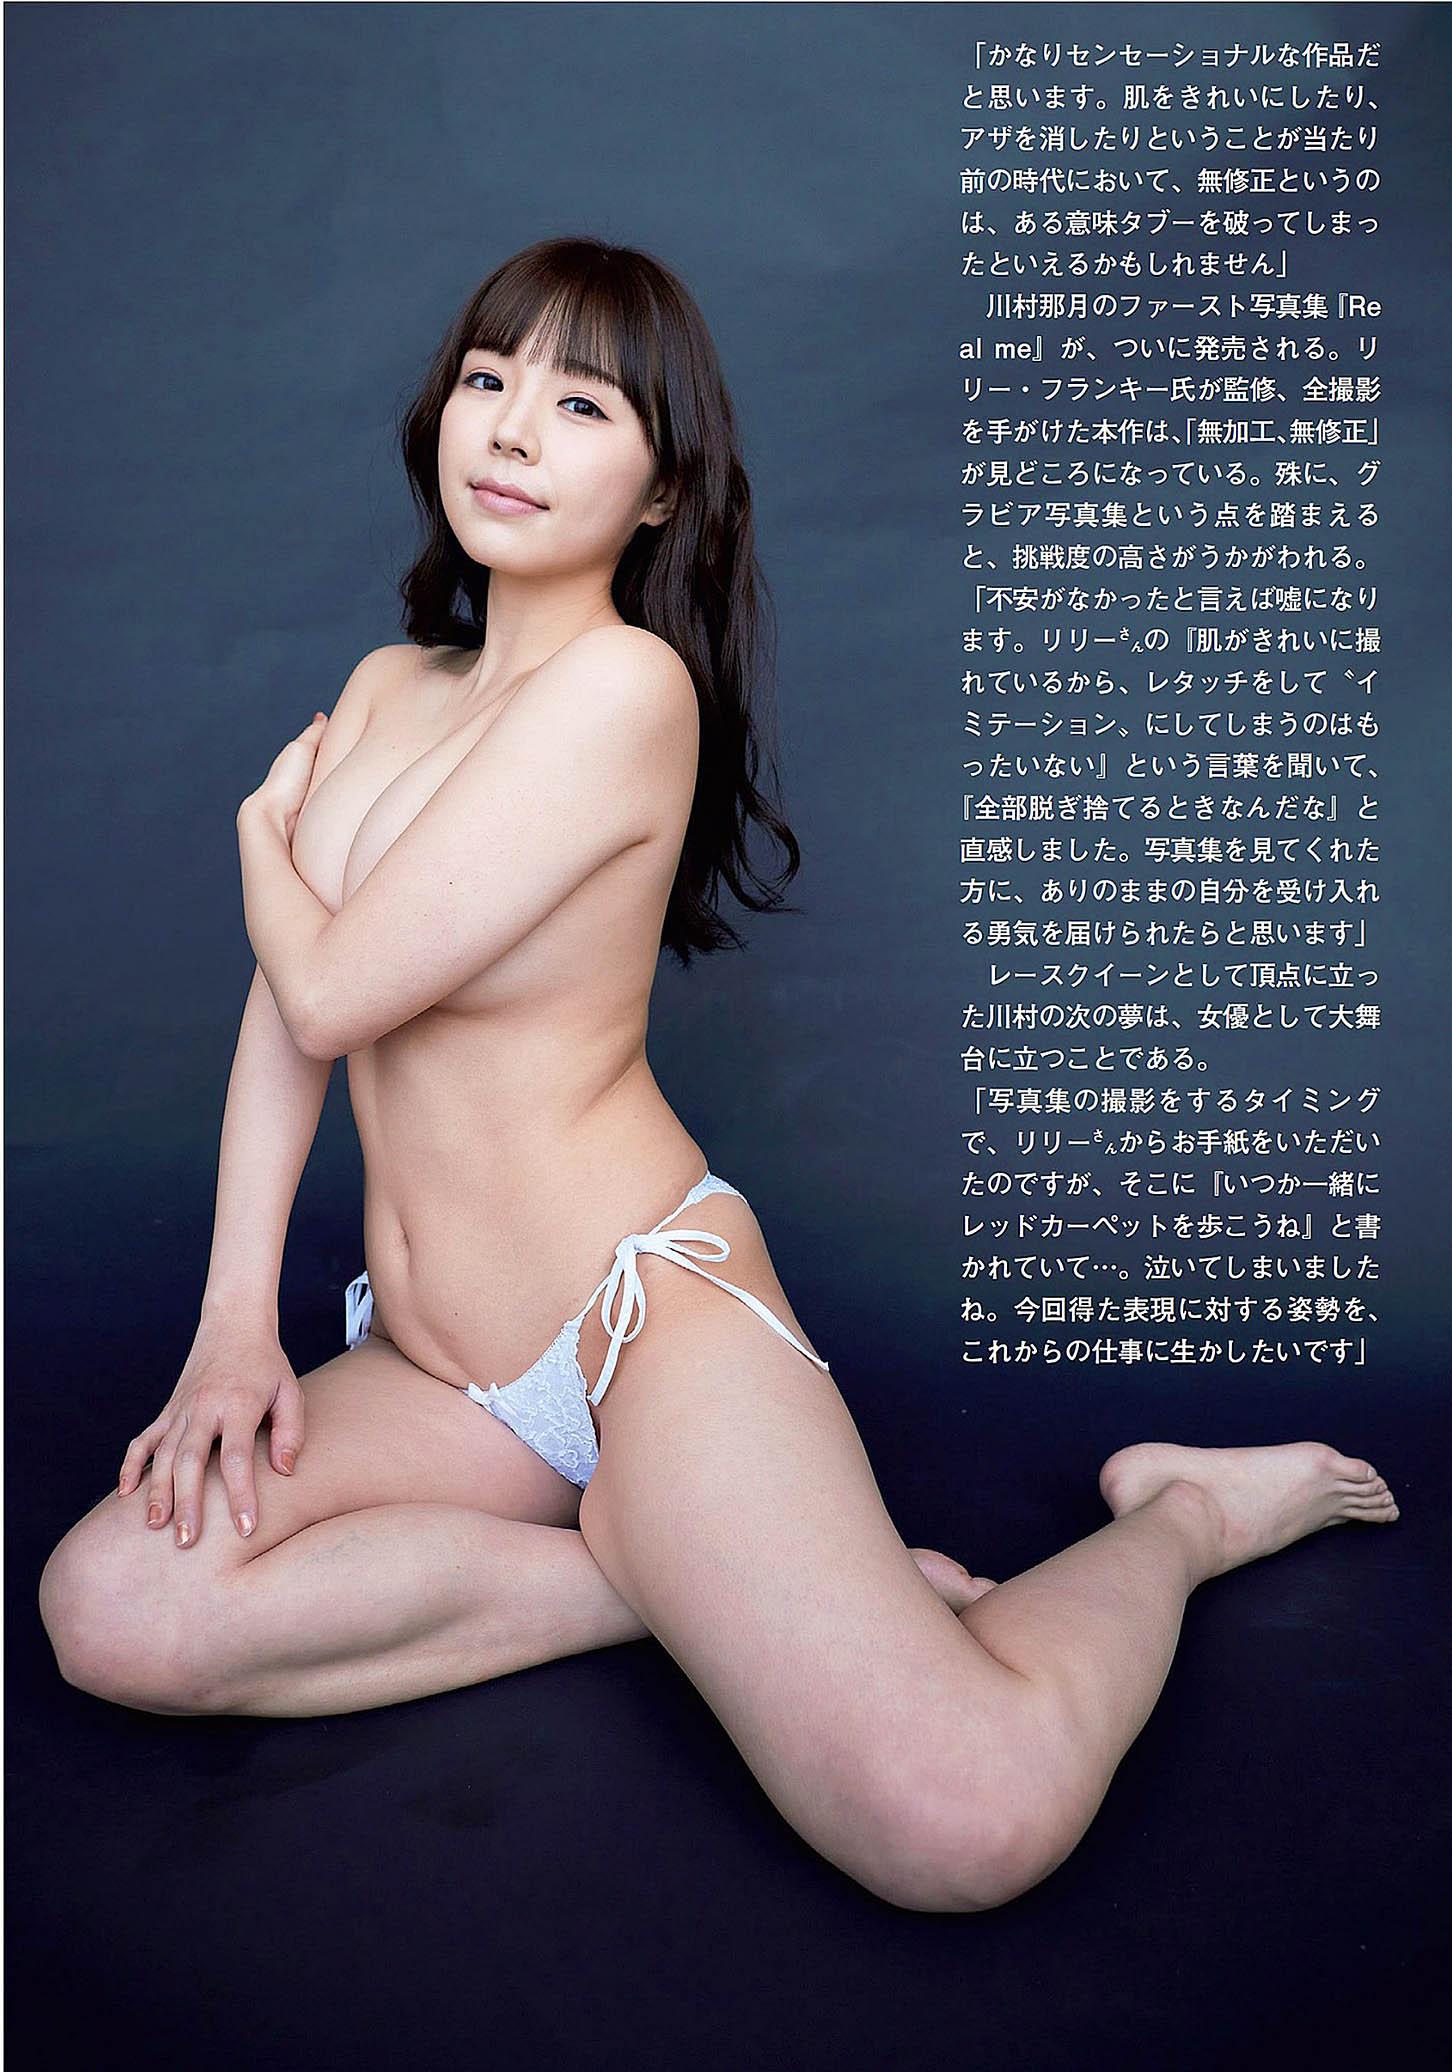 NKawamura Flash 210413 05.jpg